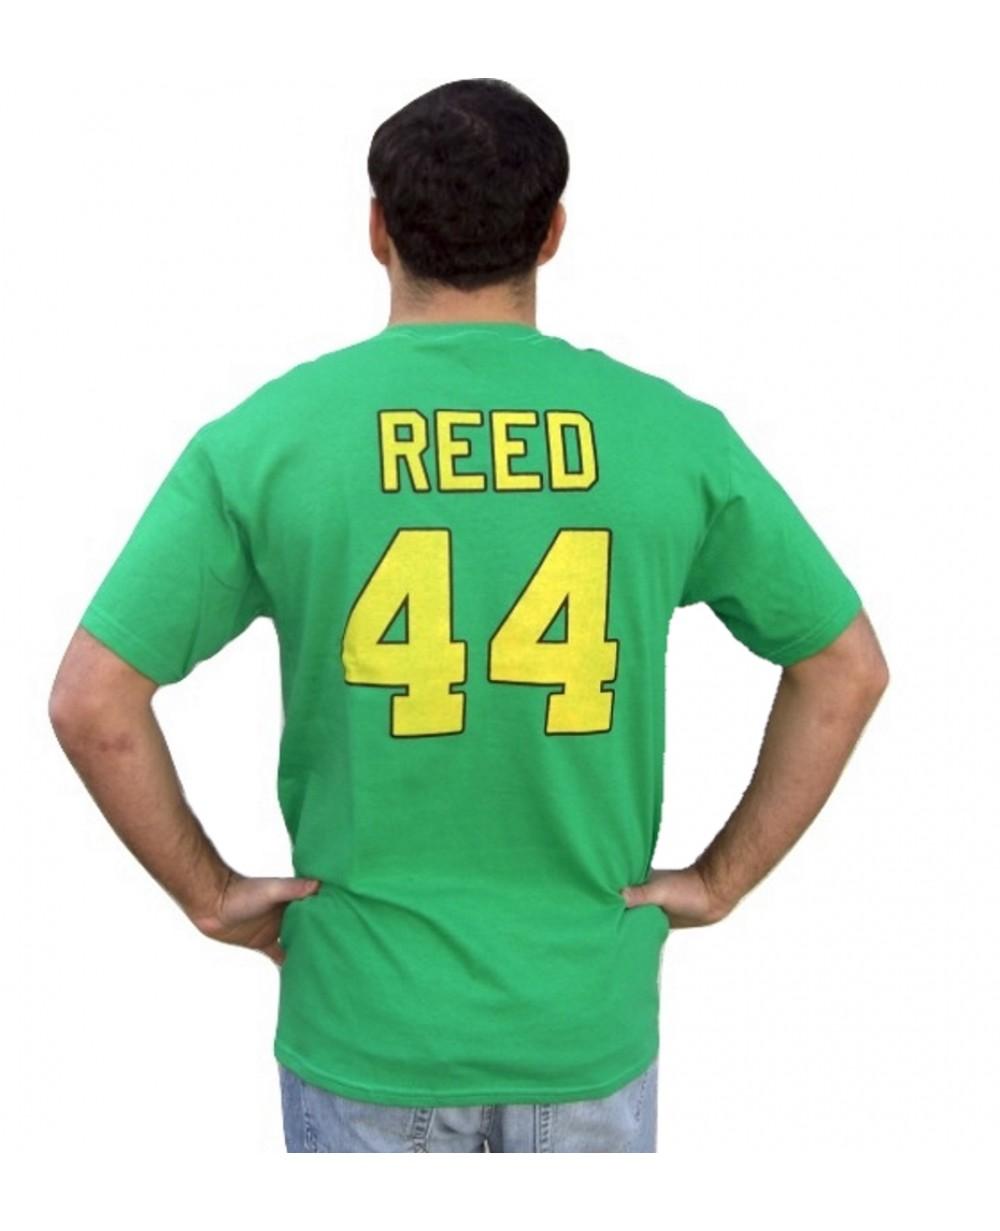 Fulton Reed #44 Ducks Jersey T-Shirt